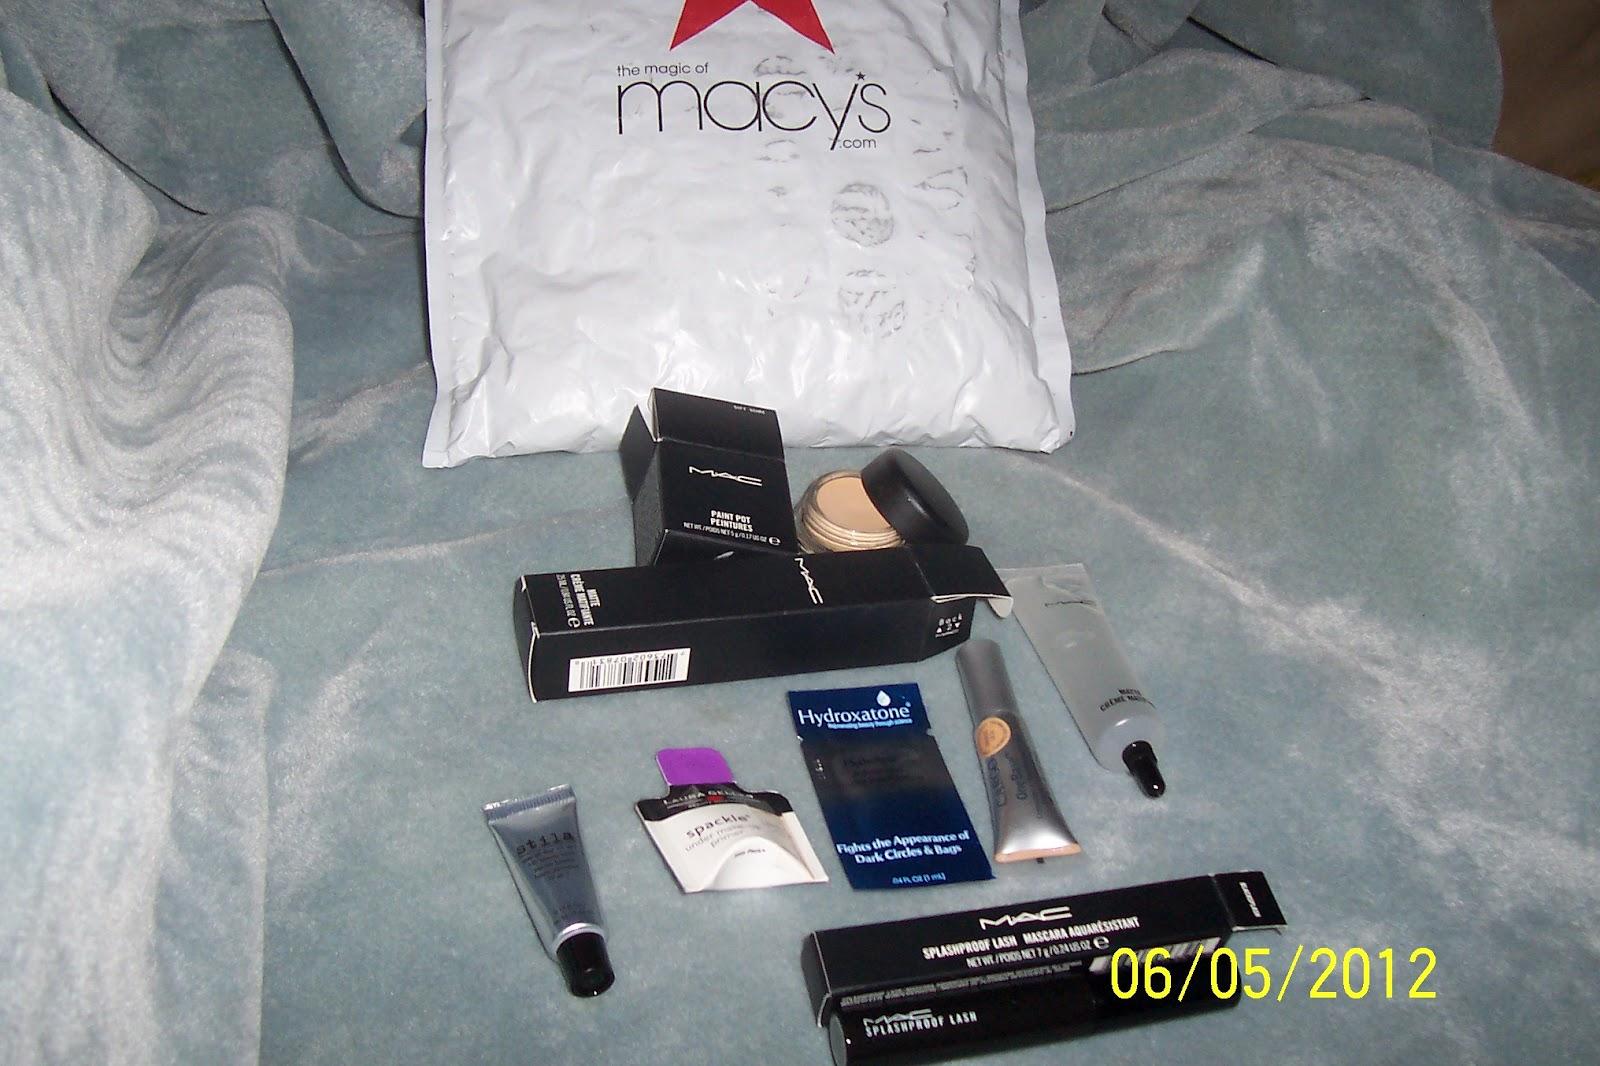 Marina's Makeup Blog: Macy's Online Mini Mac Haul 06/01/2012